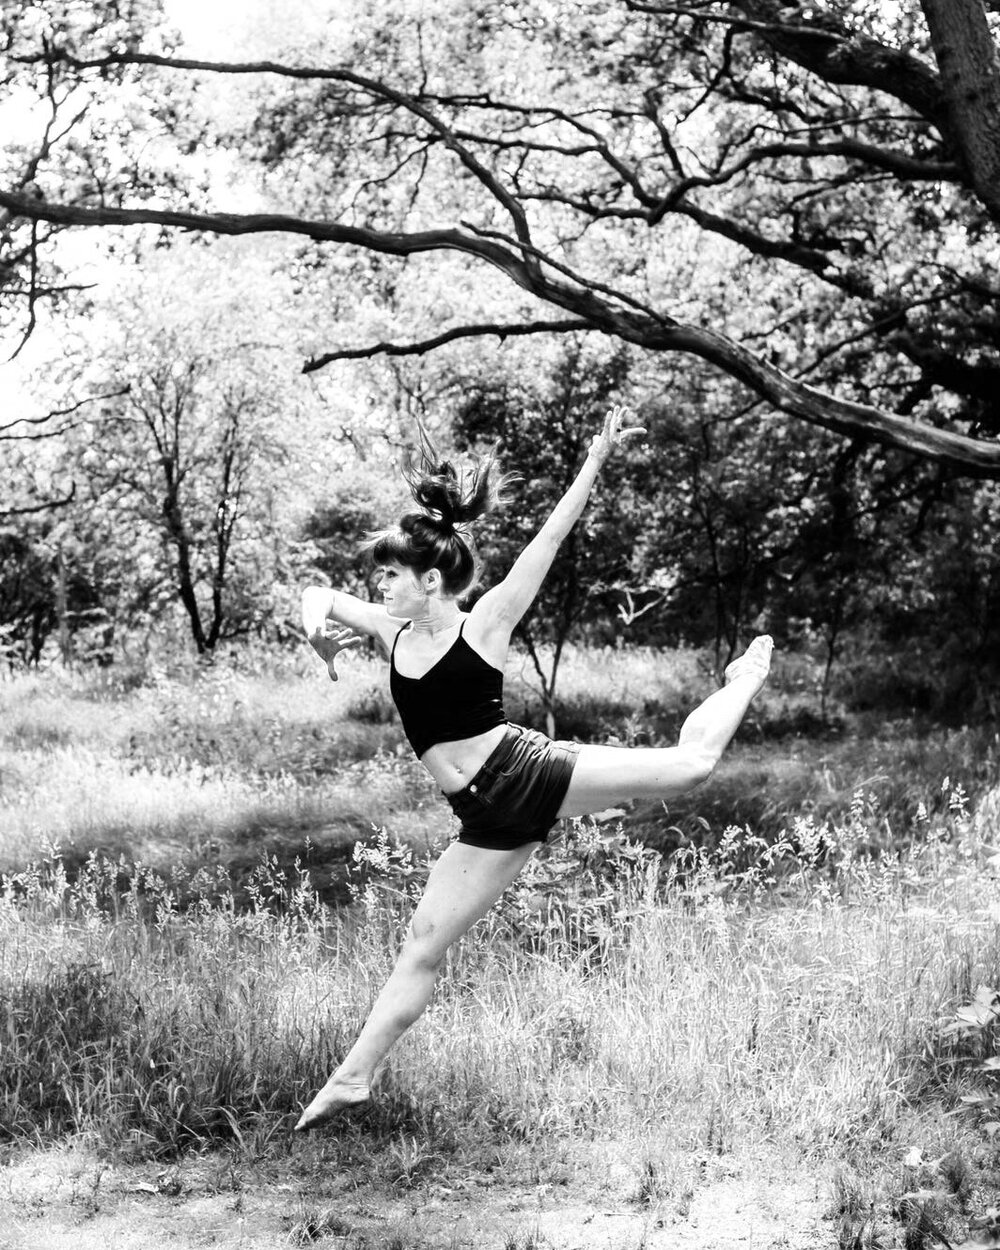 Simone - danseres gespecialiseerd in Afrikaanse dans, docente, danstherapeut en bewegingscoach